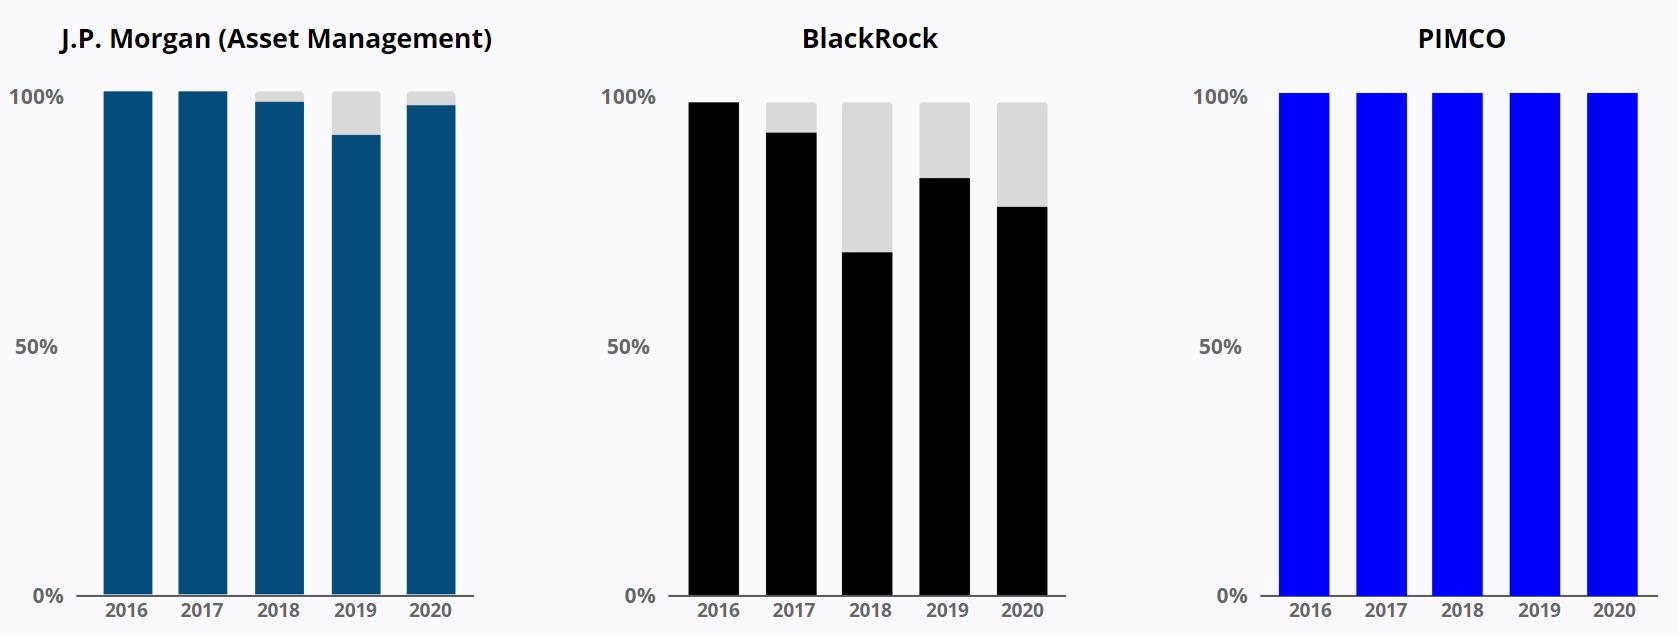 Display Ads Share - J.P. Morgan - Blackrock - PIMCO